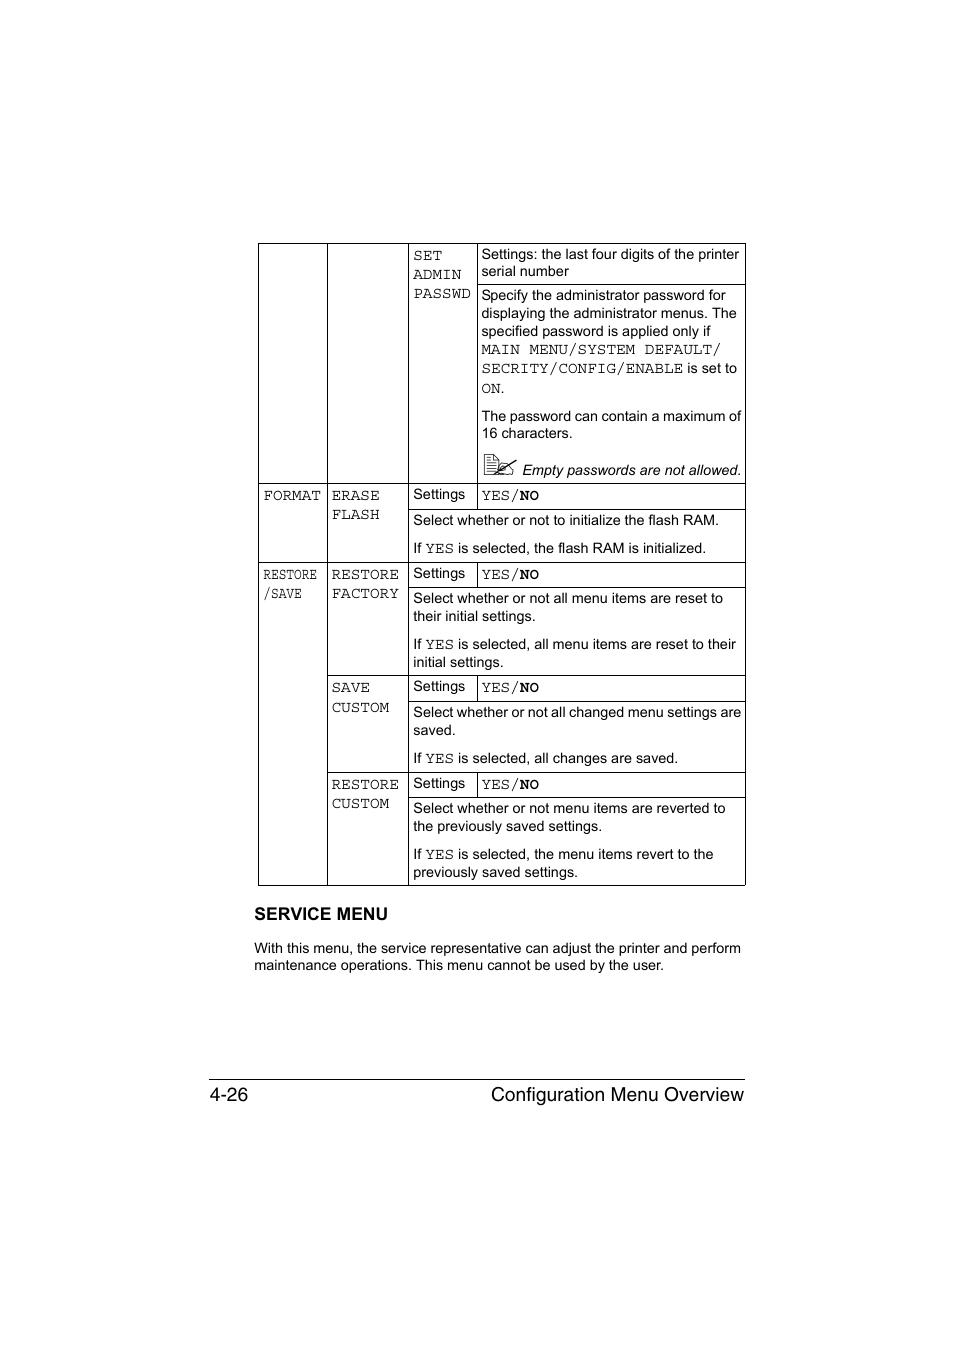 Service menu, Service menu -26, Configuration menu overview 4-26 | Konica  Minolta magicolor 1650EN User Manual | Page 65 / 191